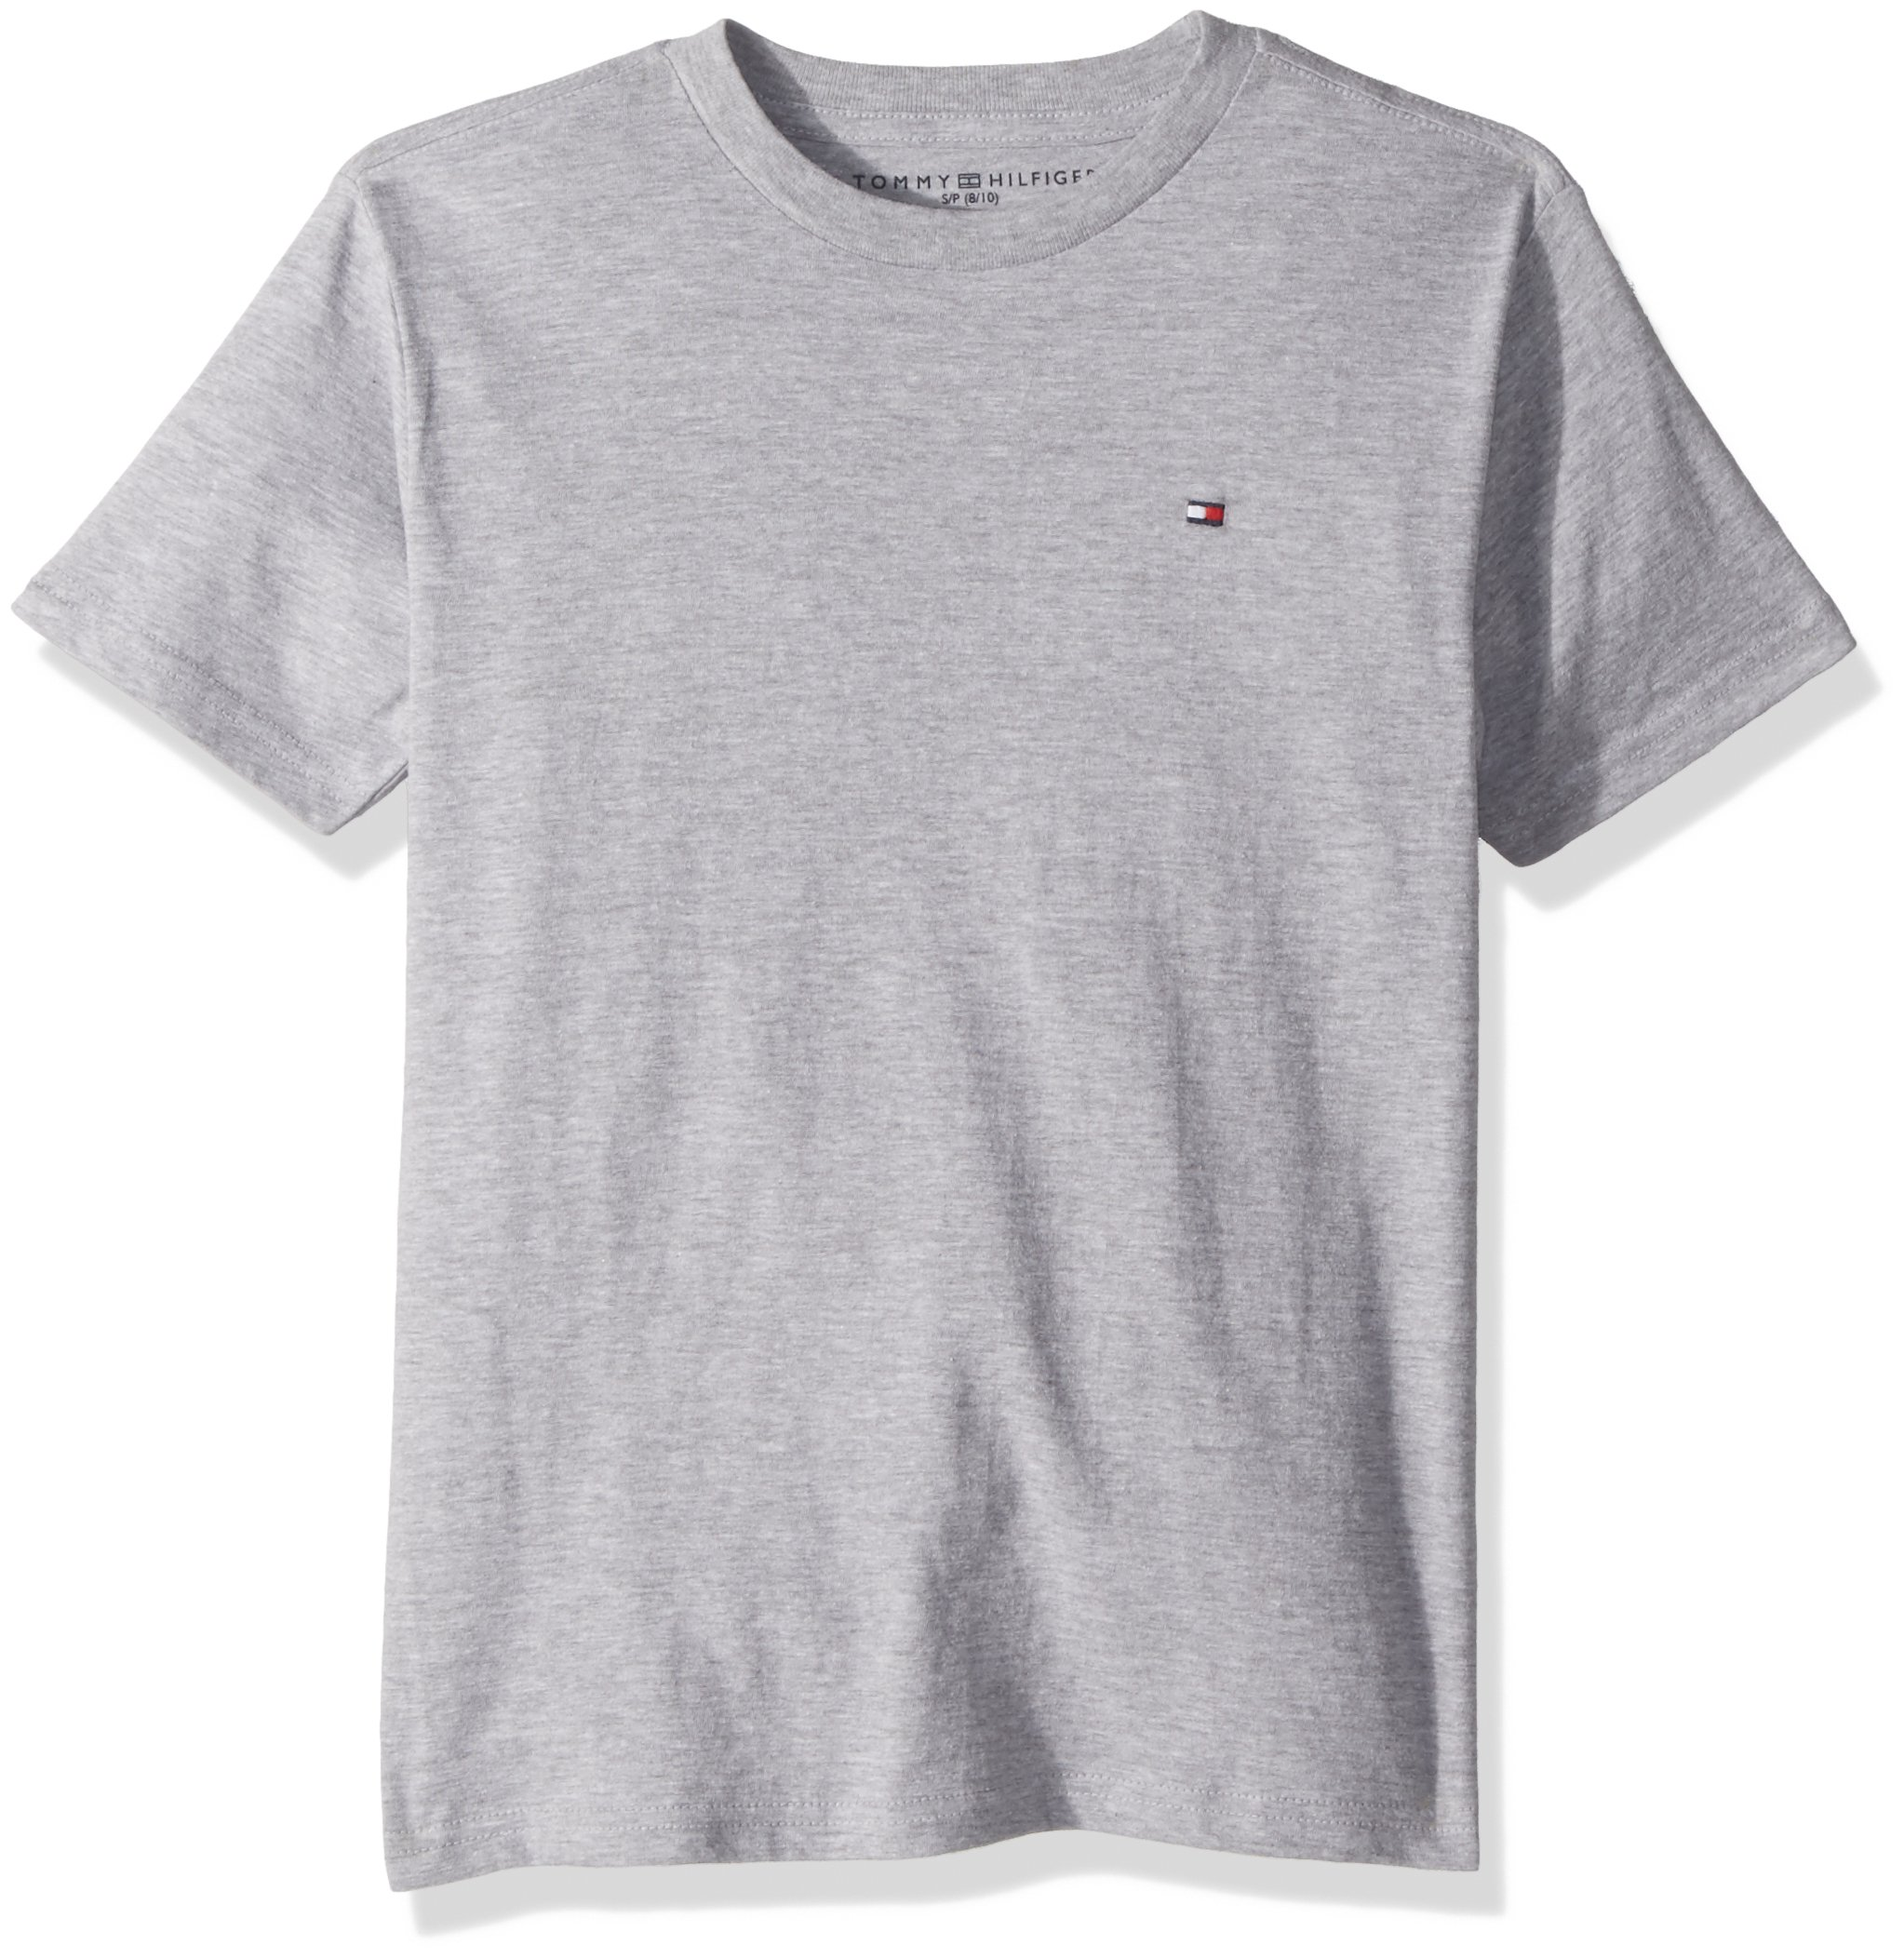 Tommy Hilfiger Boys' Little Short Sleeve Solid Crew-Neck T-Shirt, Grey Heather 7